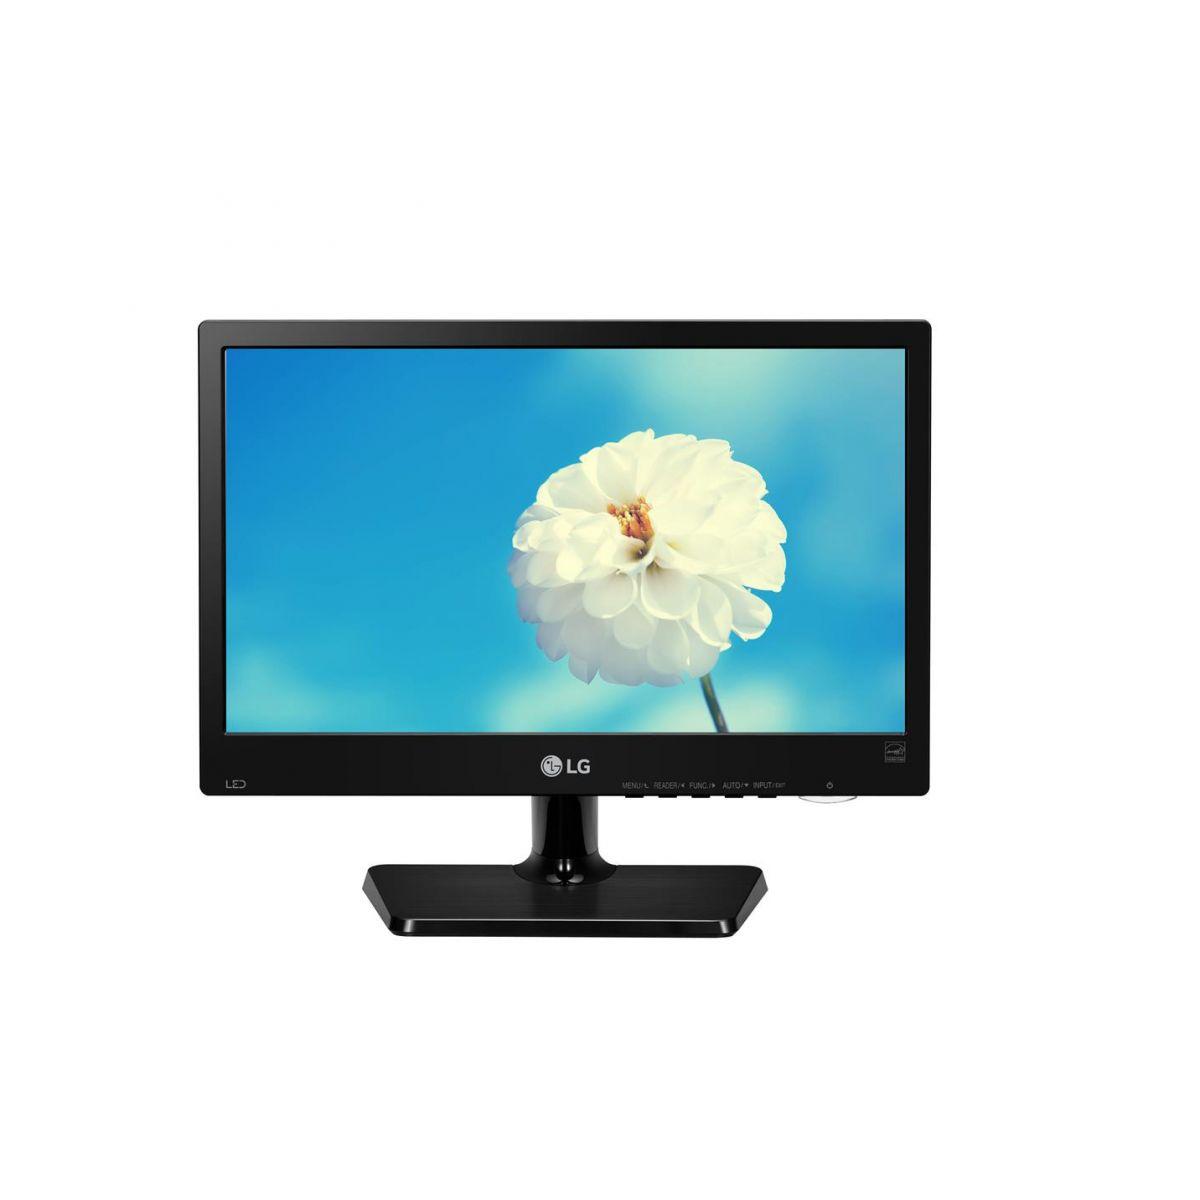 Monitor LG Widescreen Led 15.6 Polegadas Preto - 16M38A